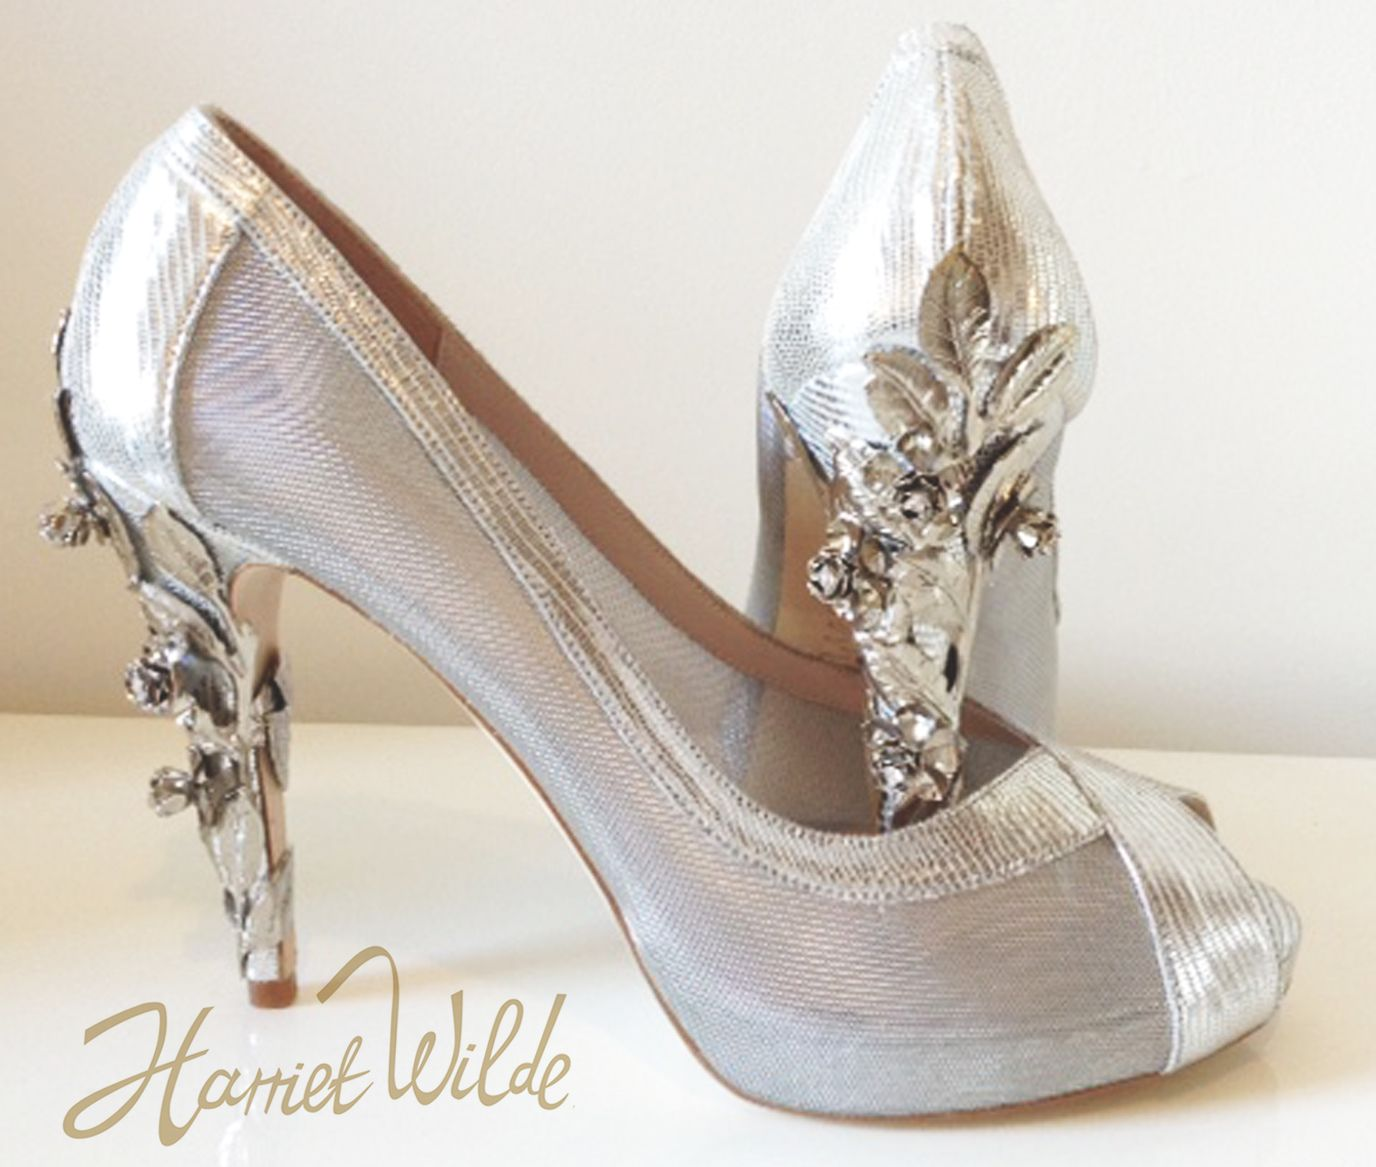 Flora Bespoke Harriet Wilde Wedding Shoes Price On Request Visit Www